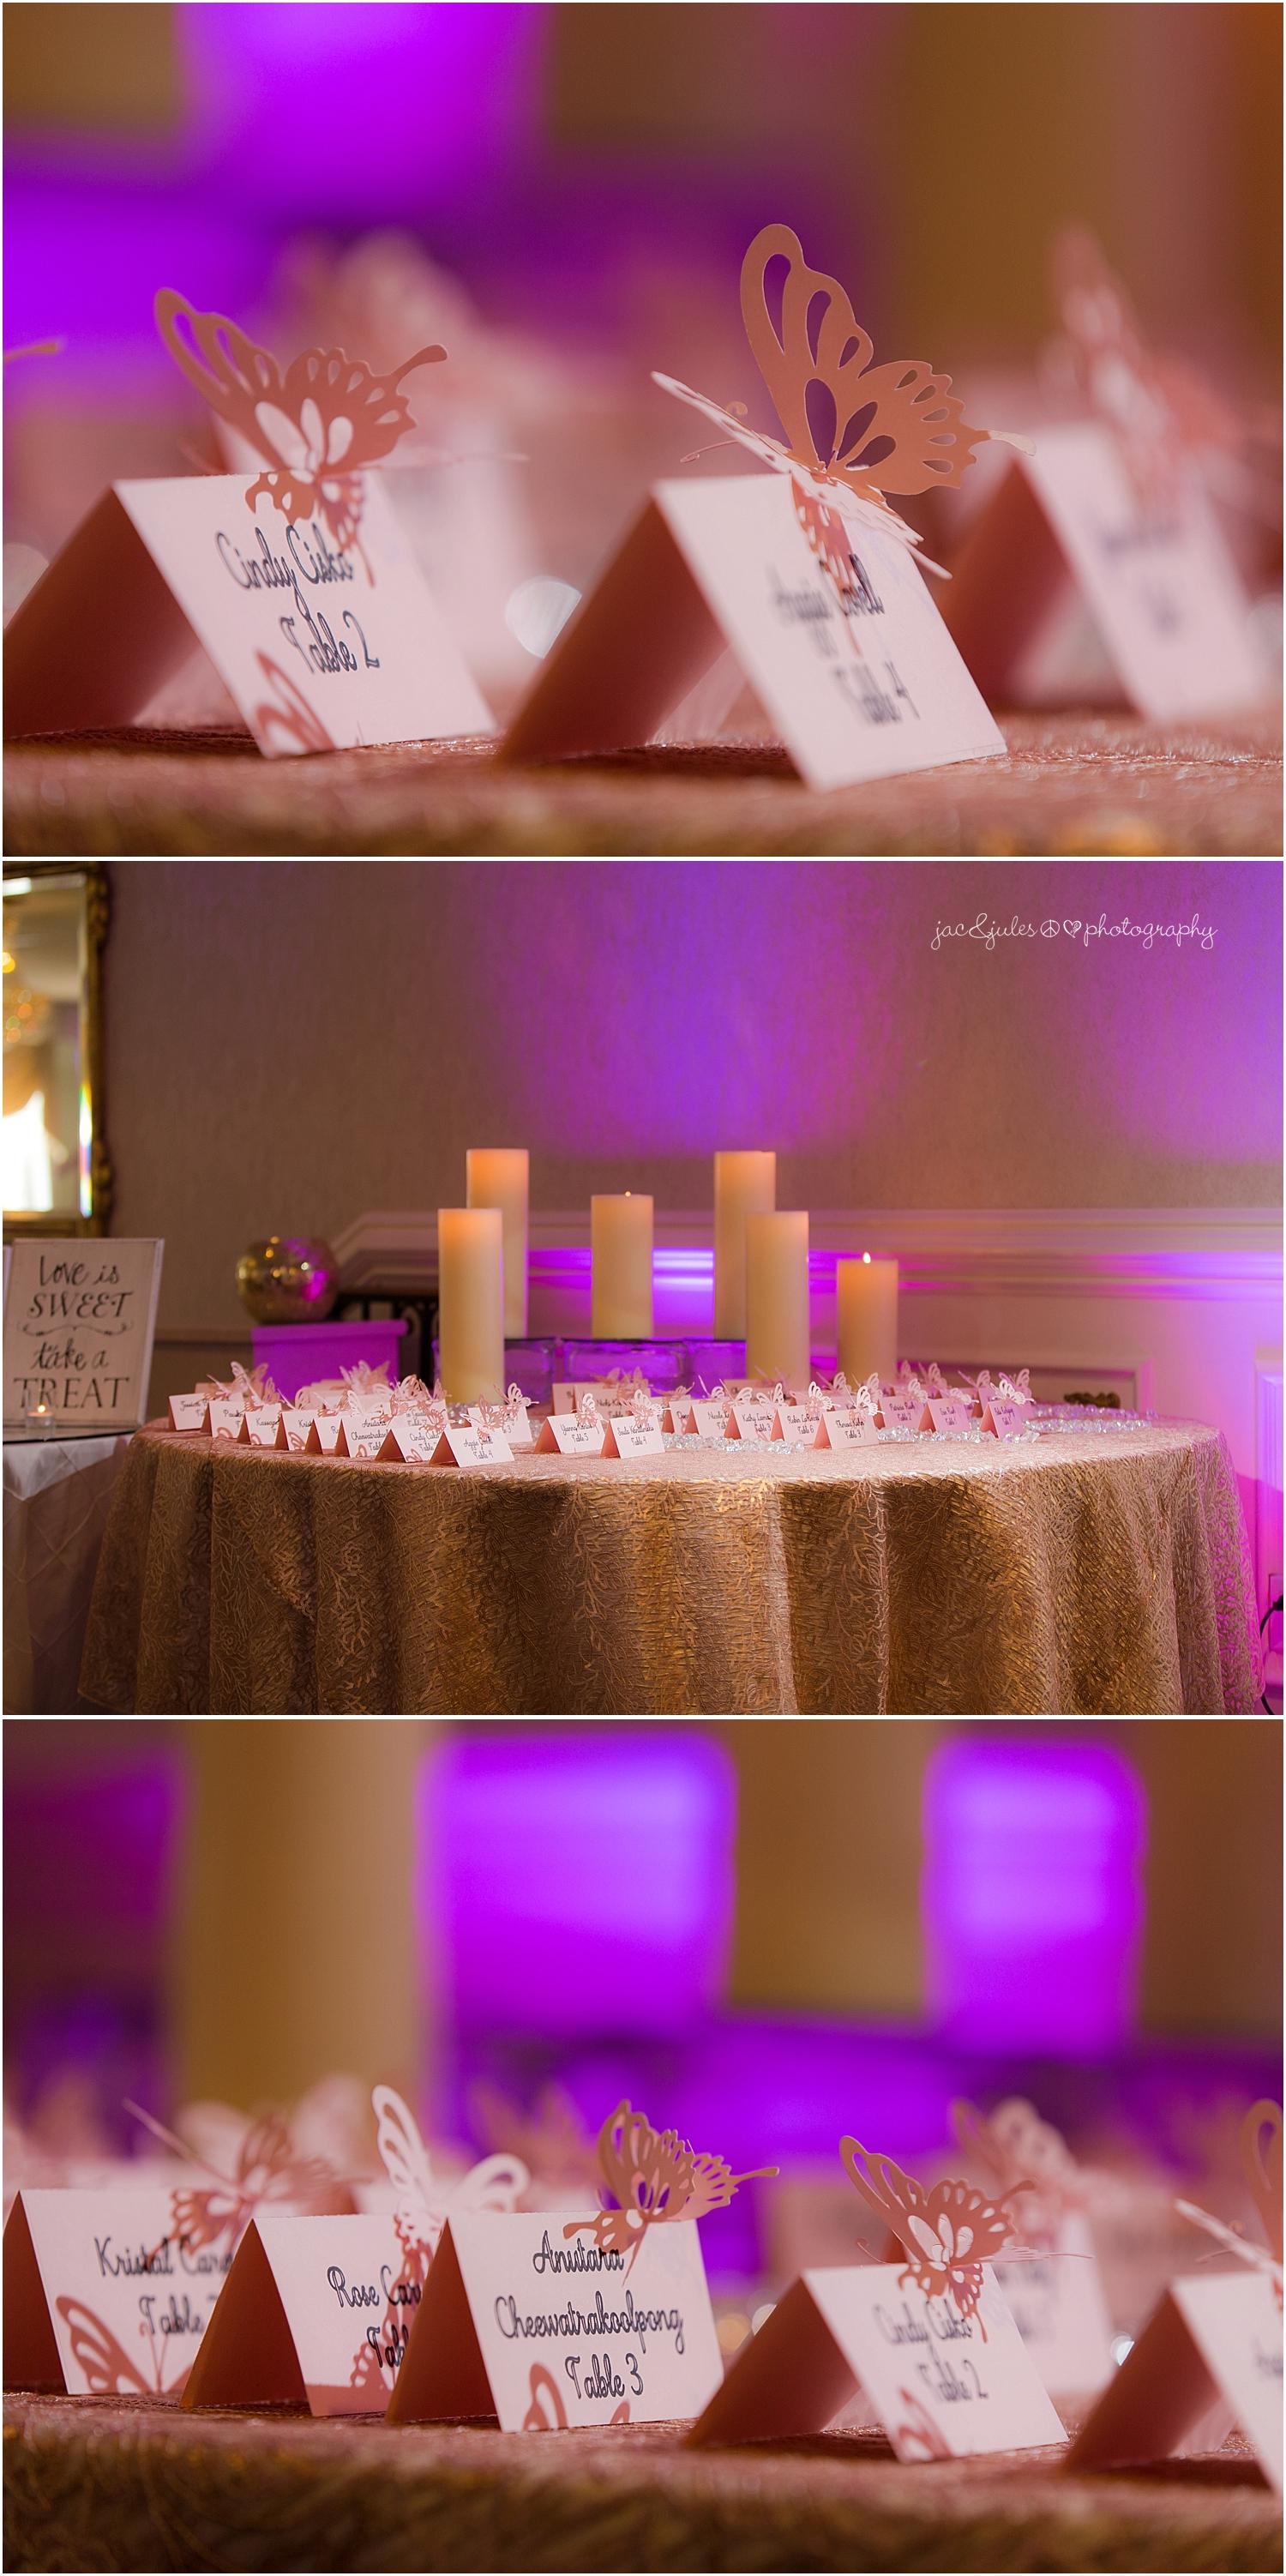 Wilshire Grand Hotel West Orange Nj Bridal Shower Nj Natural Light Photographers Jac Jules